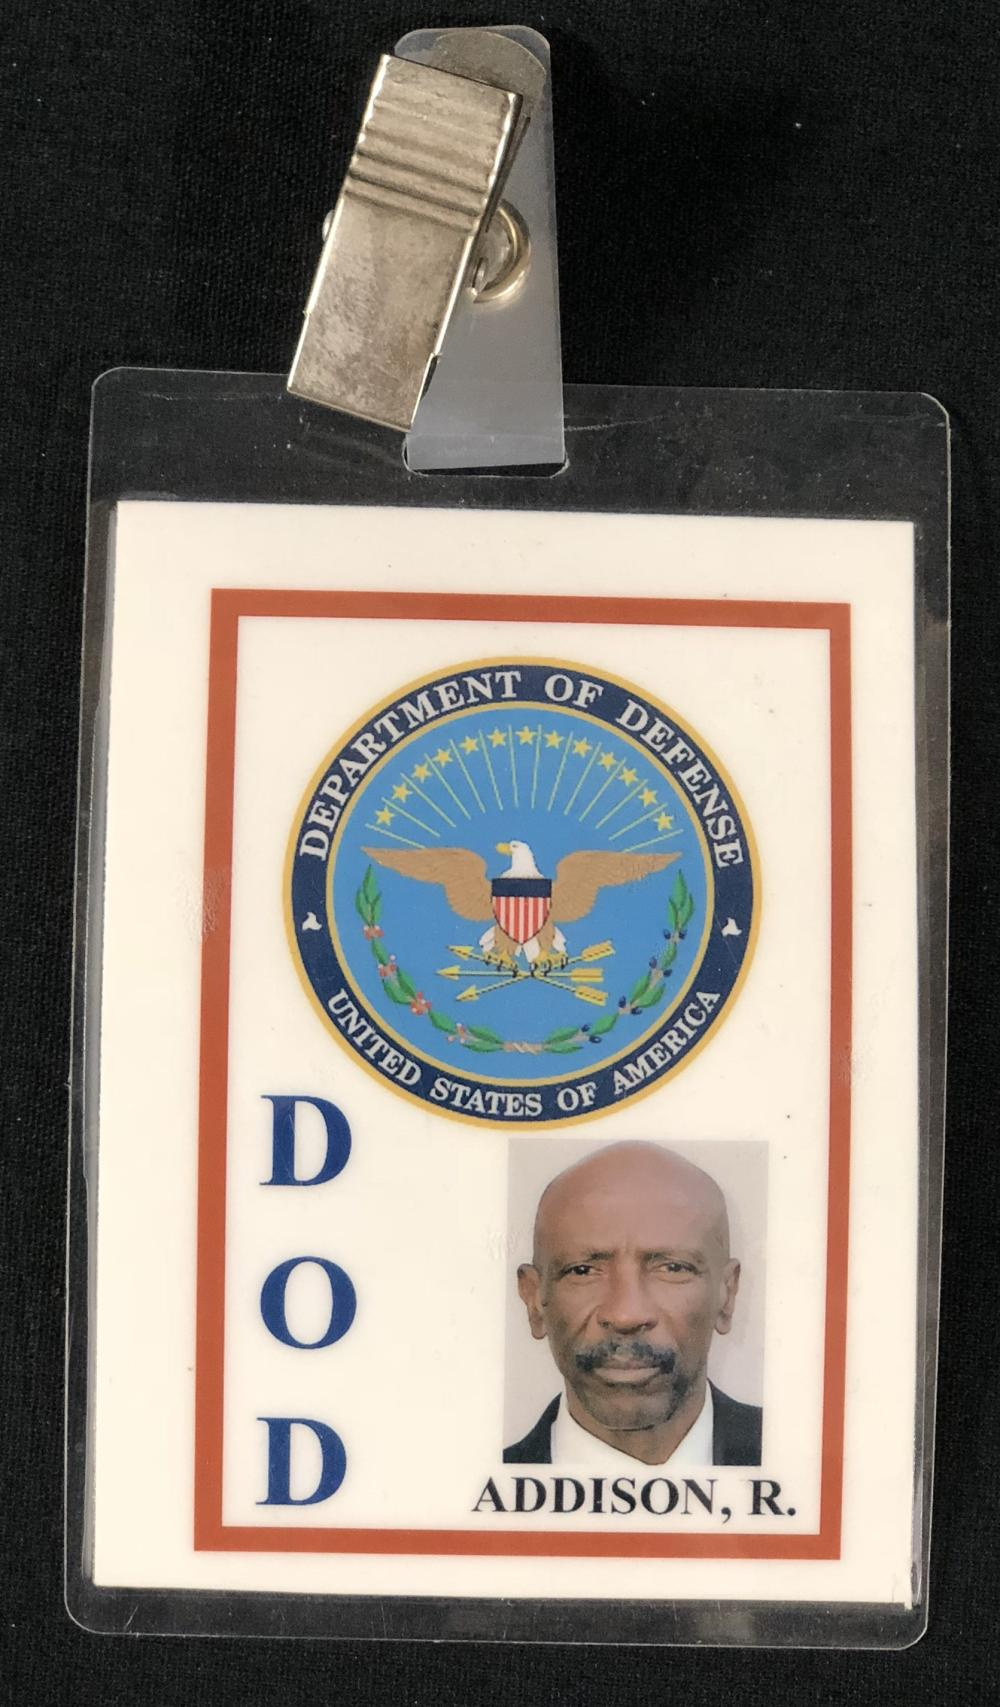 Momentum (2003) - Louis Gossett Jr. Department Of Defense Badge